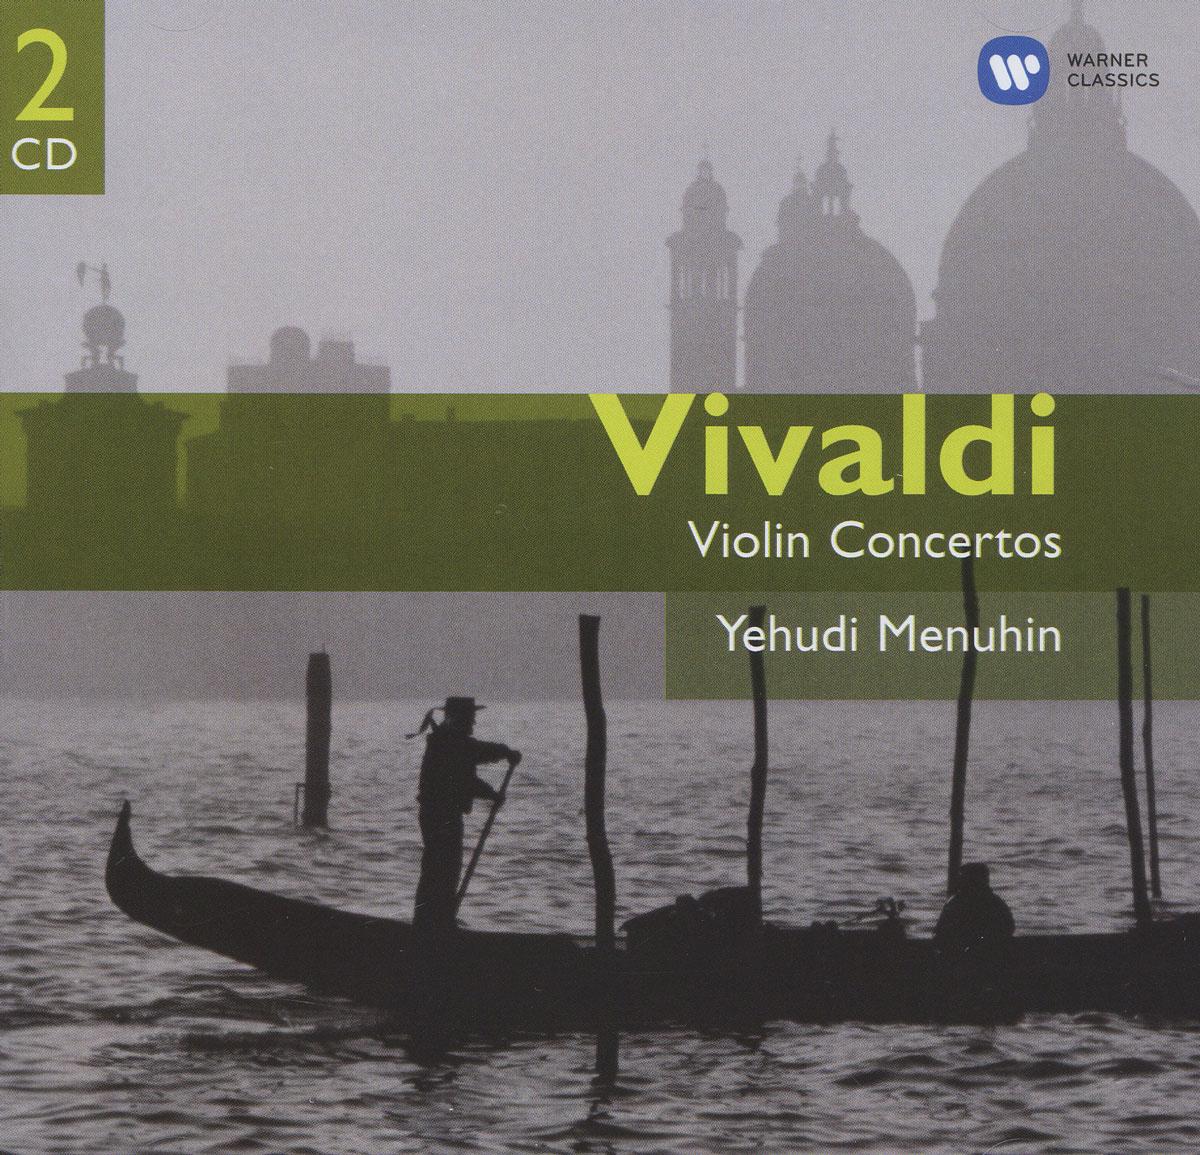 Иегуди Менухин,Polish Chamber Orchestra Vivaldi. Violin Concertos. Yehudi Menuhin (2 CD) spectral classics pl151 bg 2 boxes